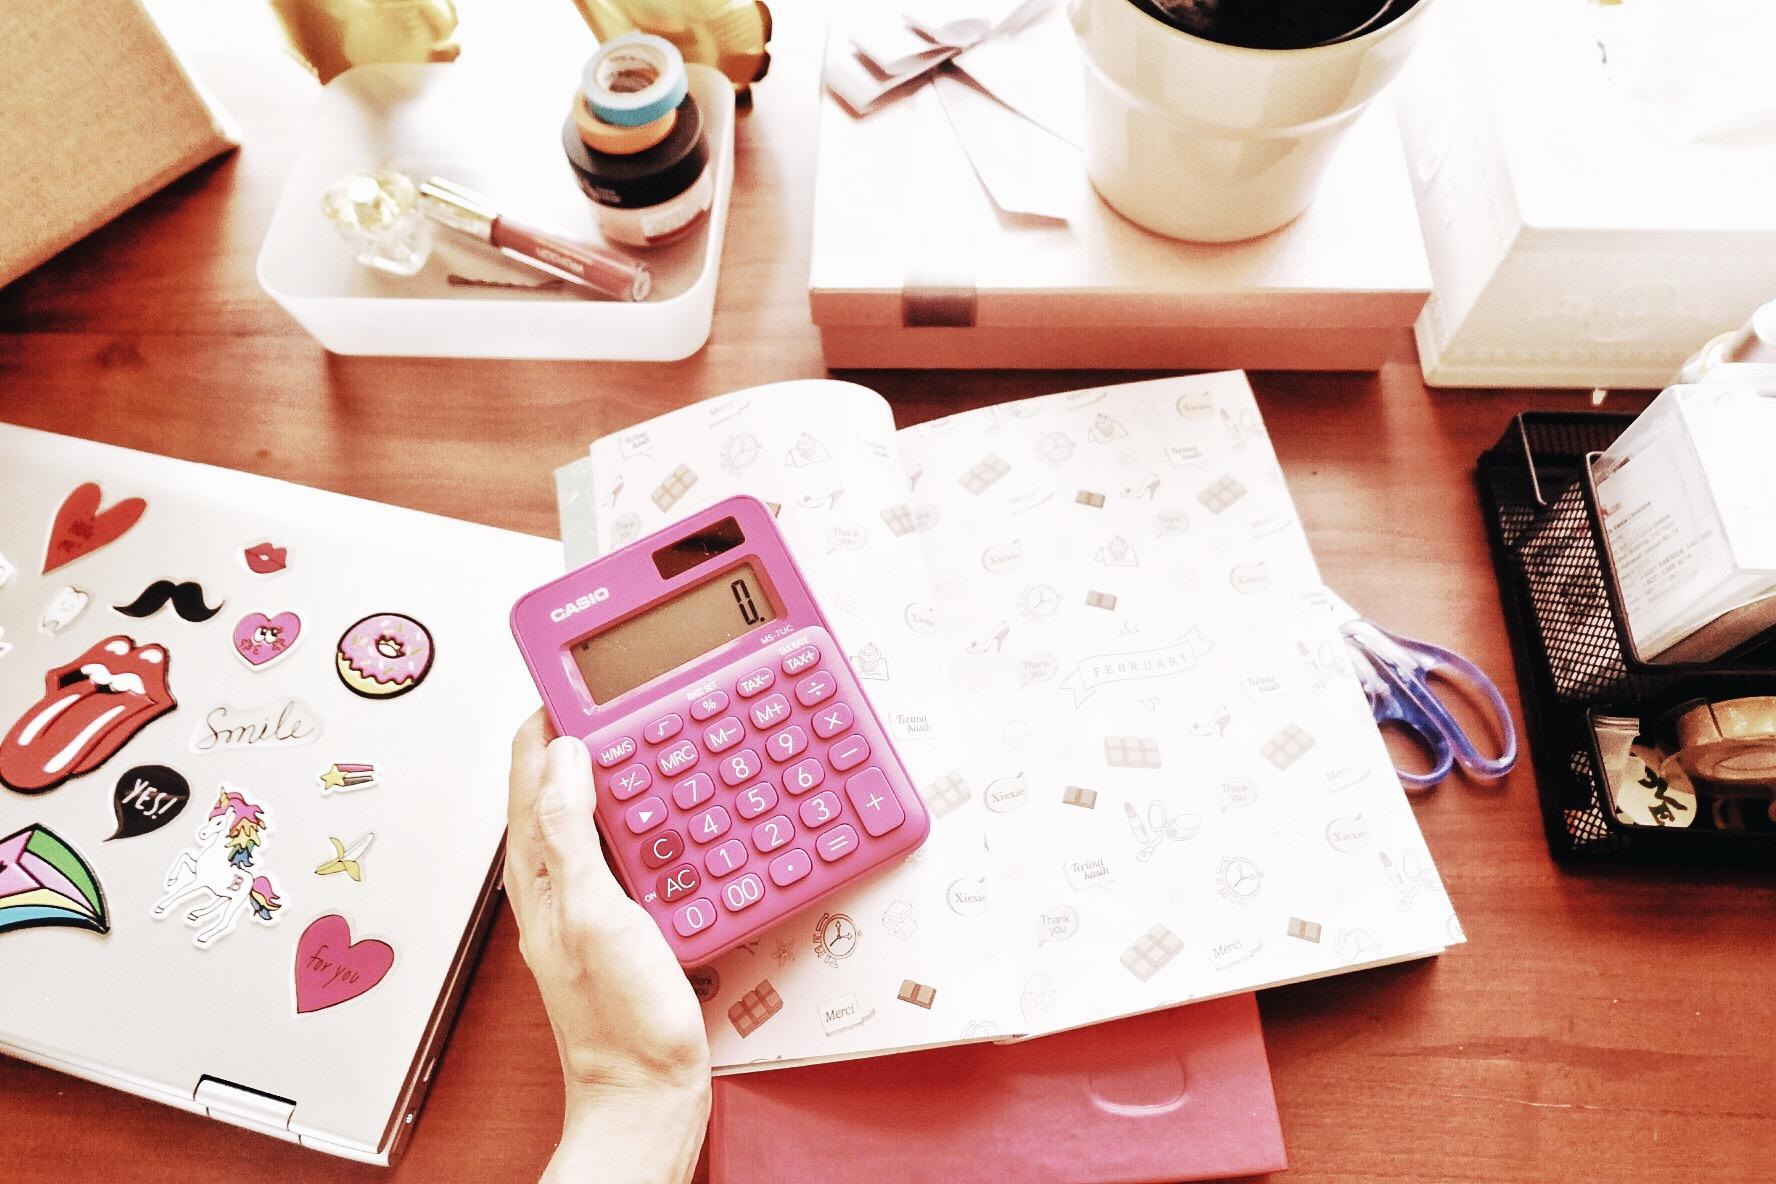 ruthvcp-casio-my-style-colorful-calculator-4.JPG